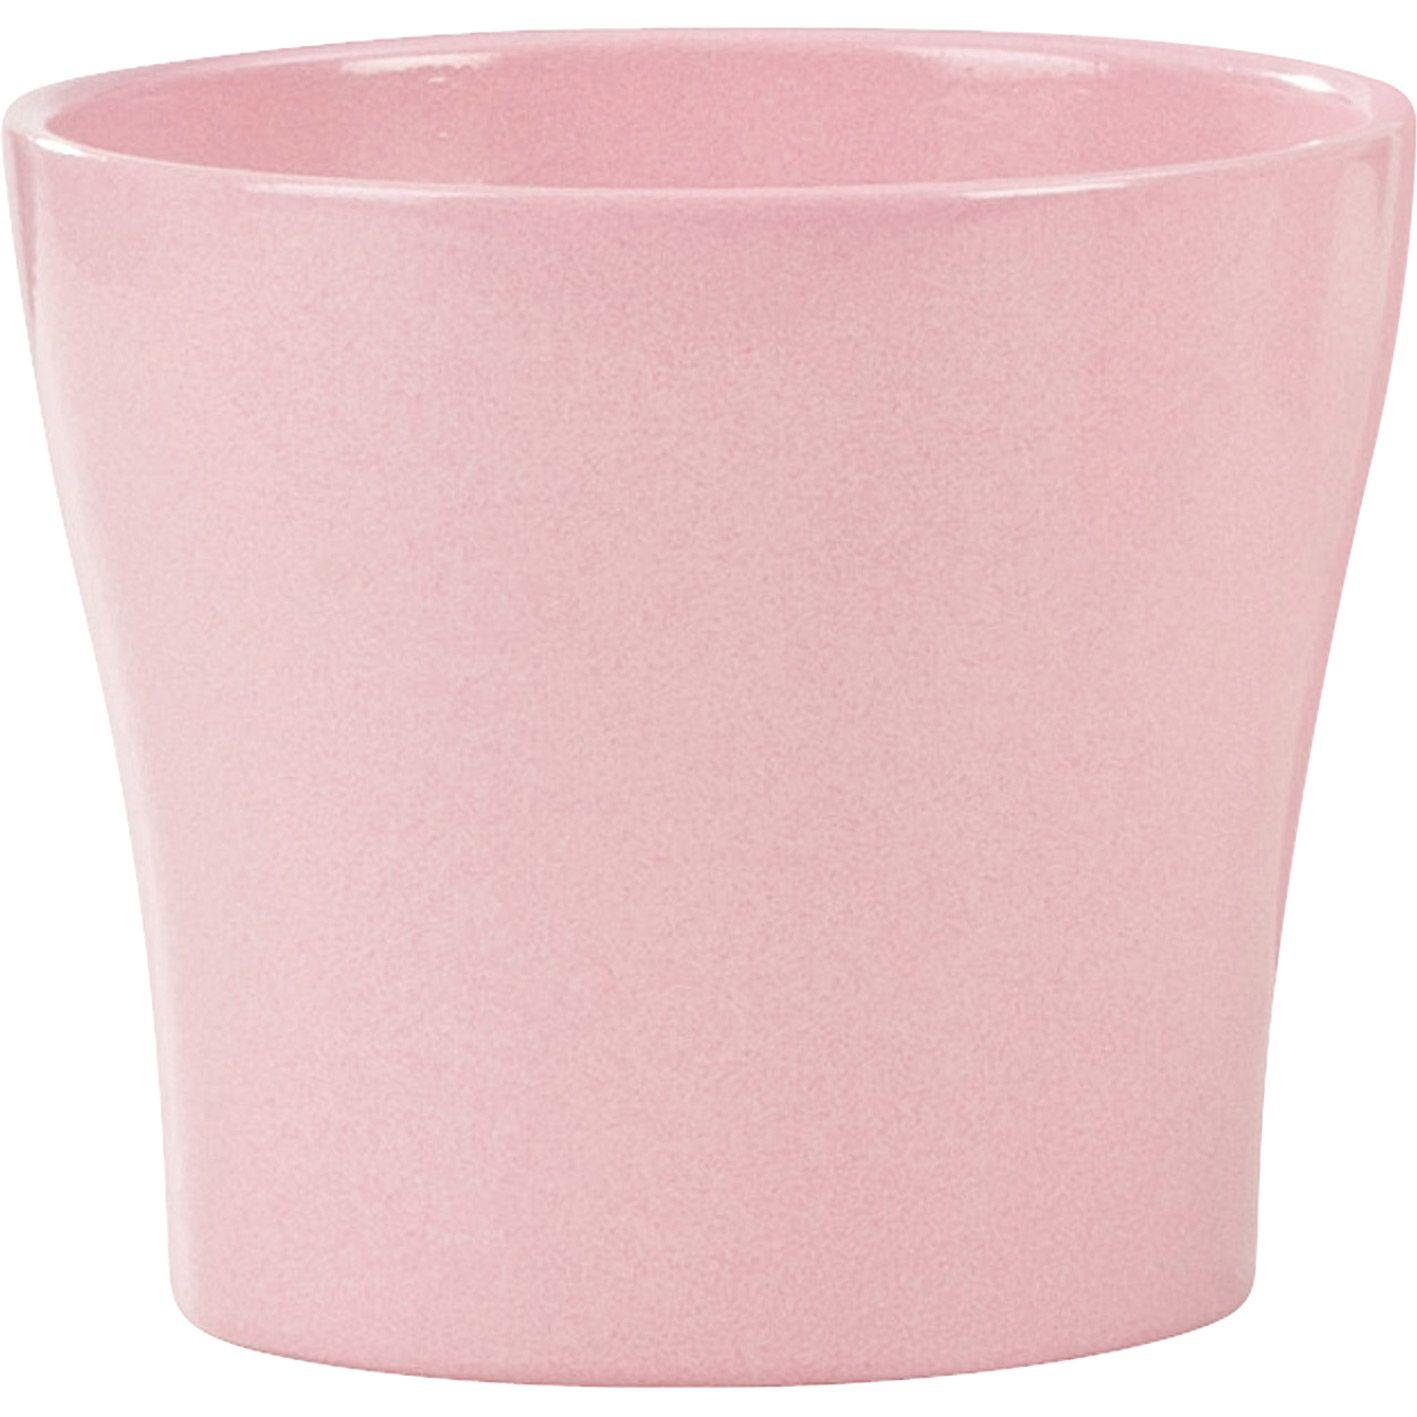 Http Www Leroymerlin Fr V3 P Produits Cache Pot En Terre Cuite